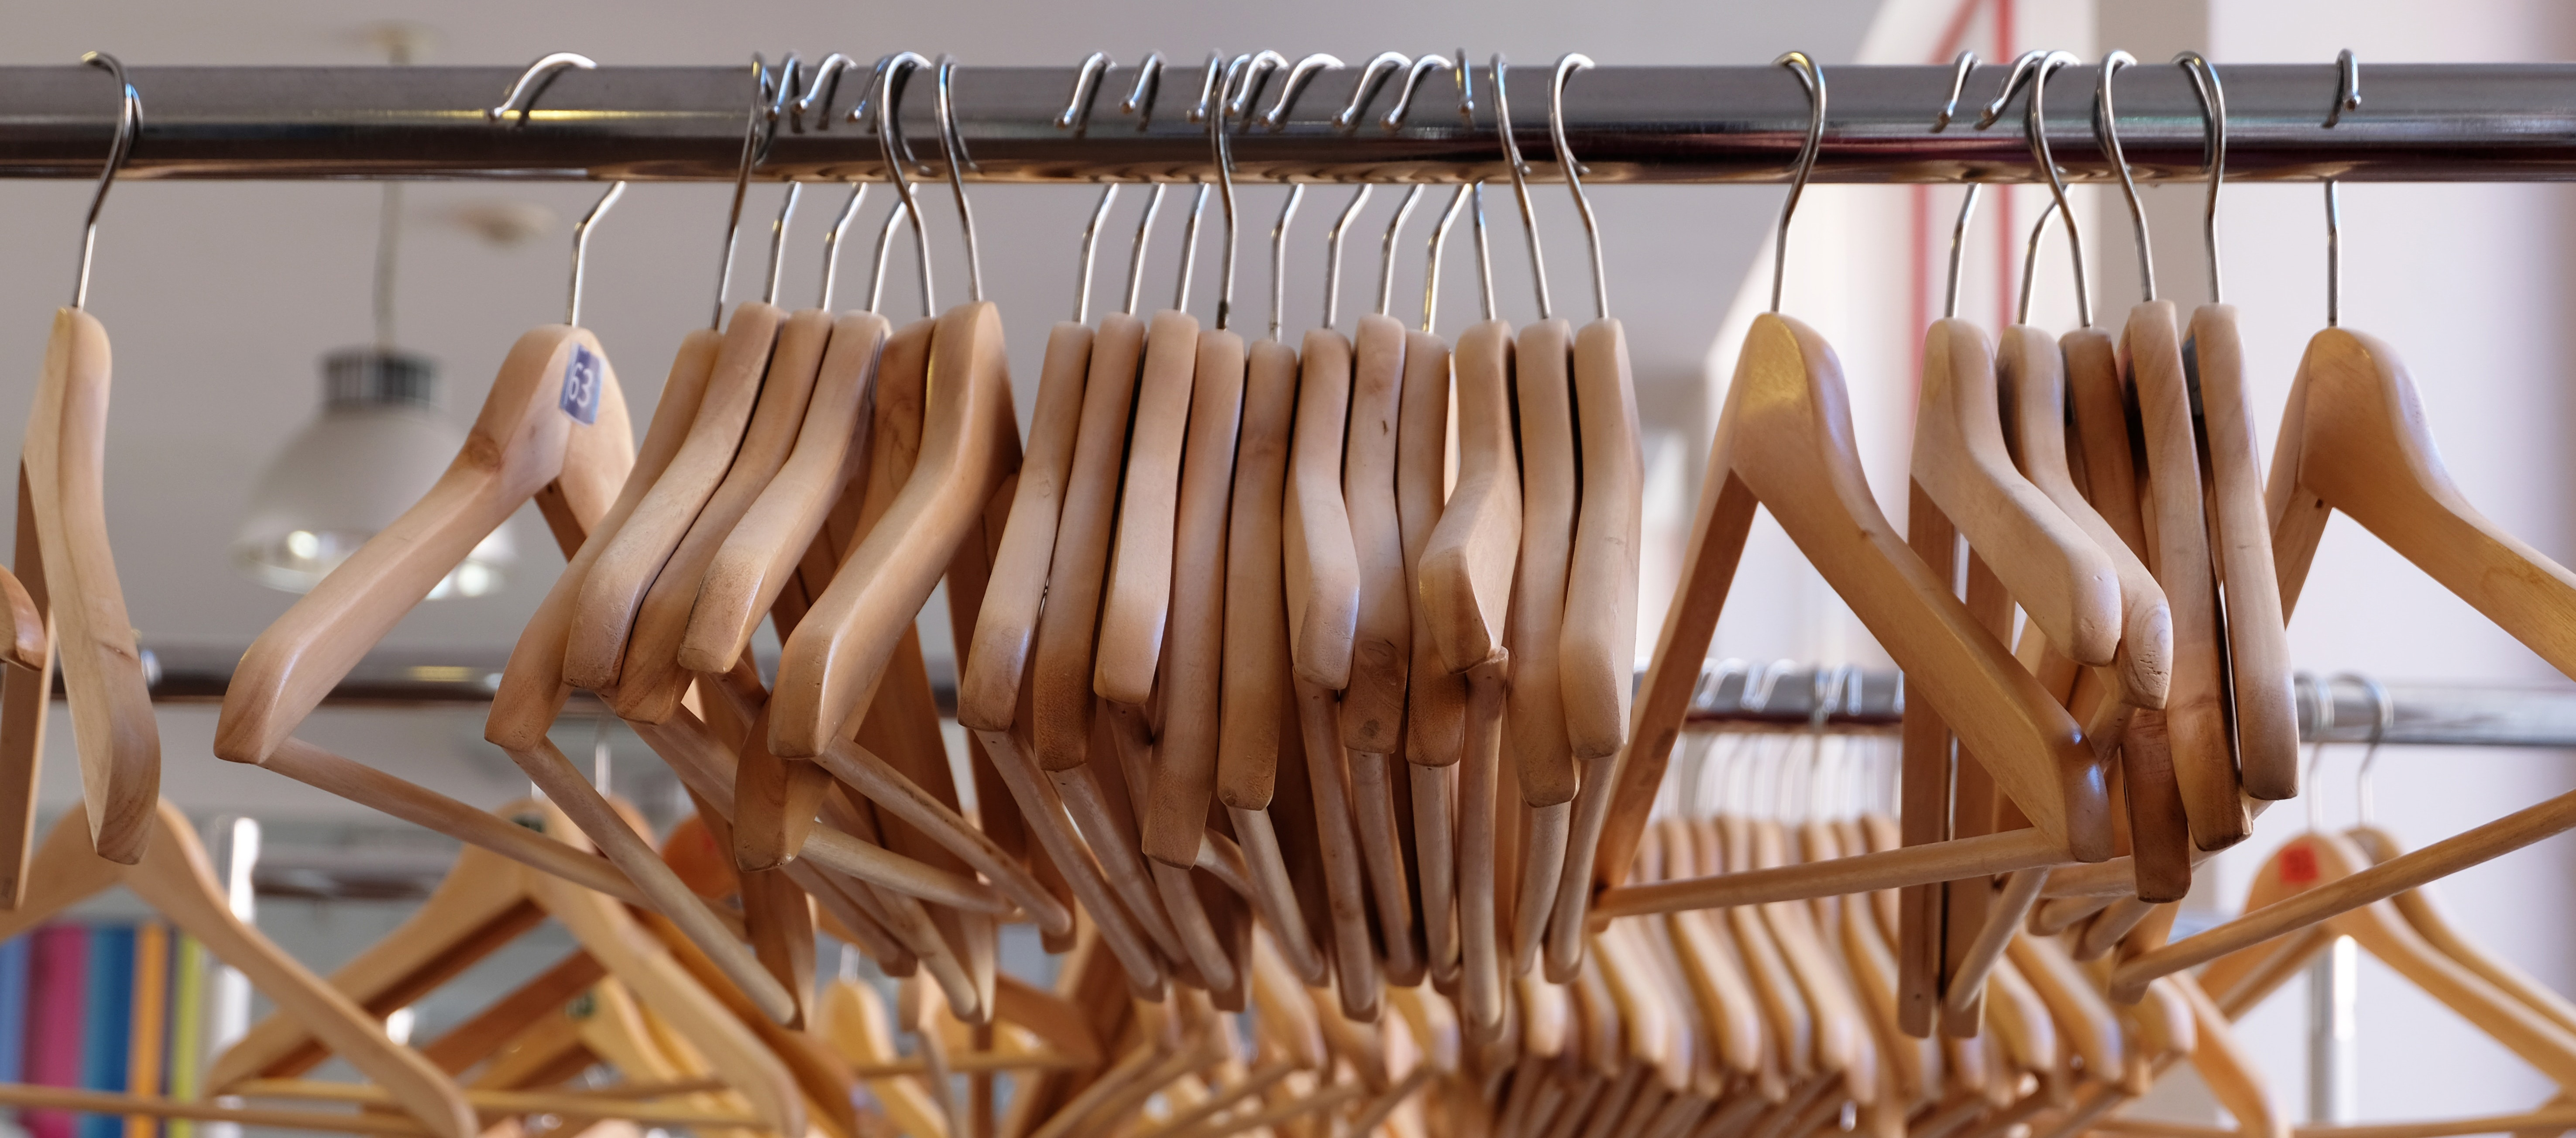 empty-clothes-hangers.jpg